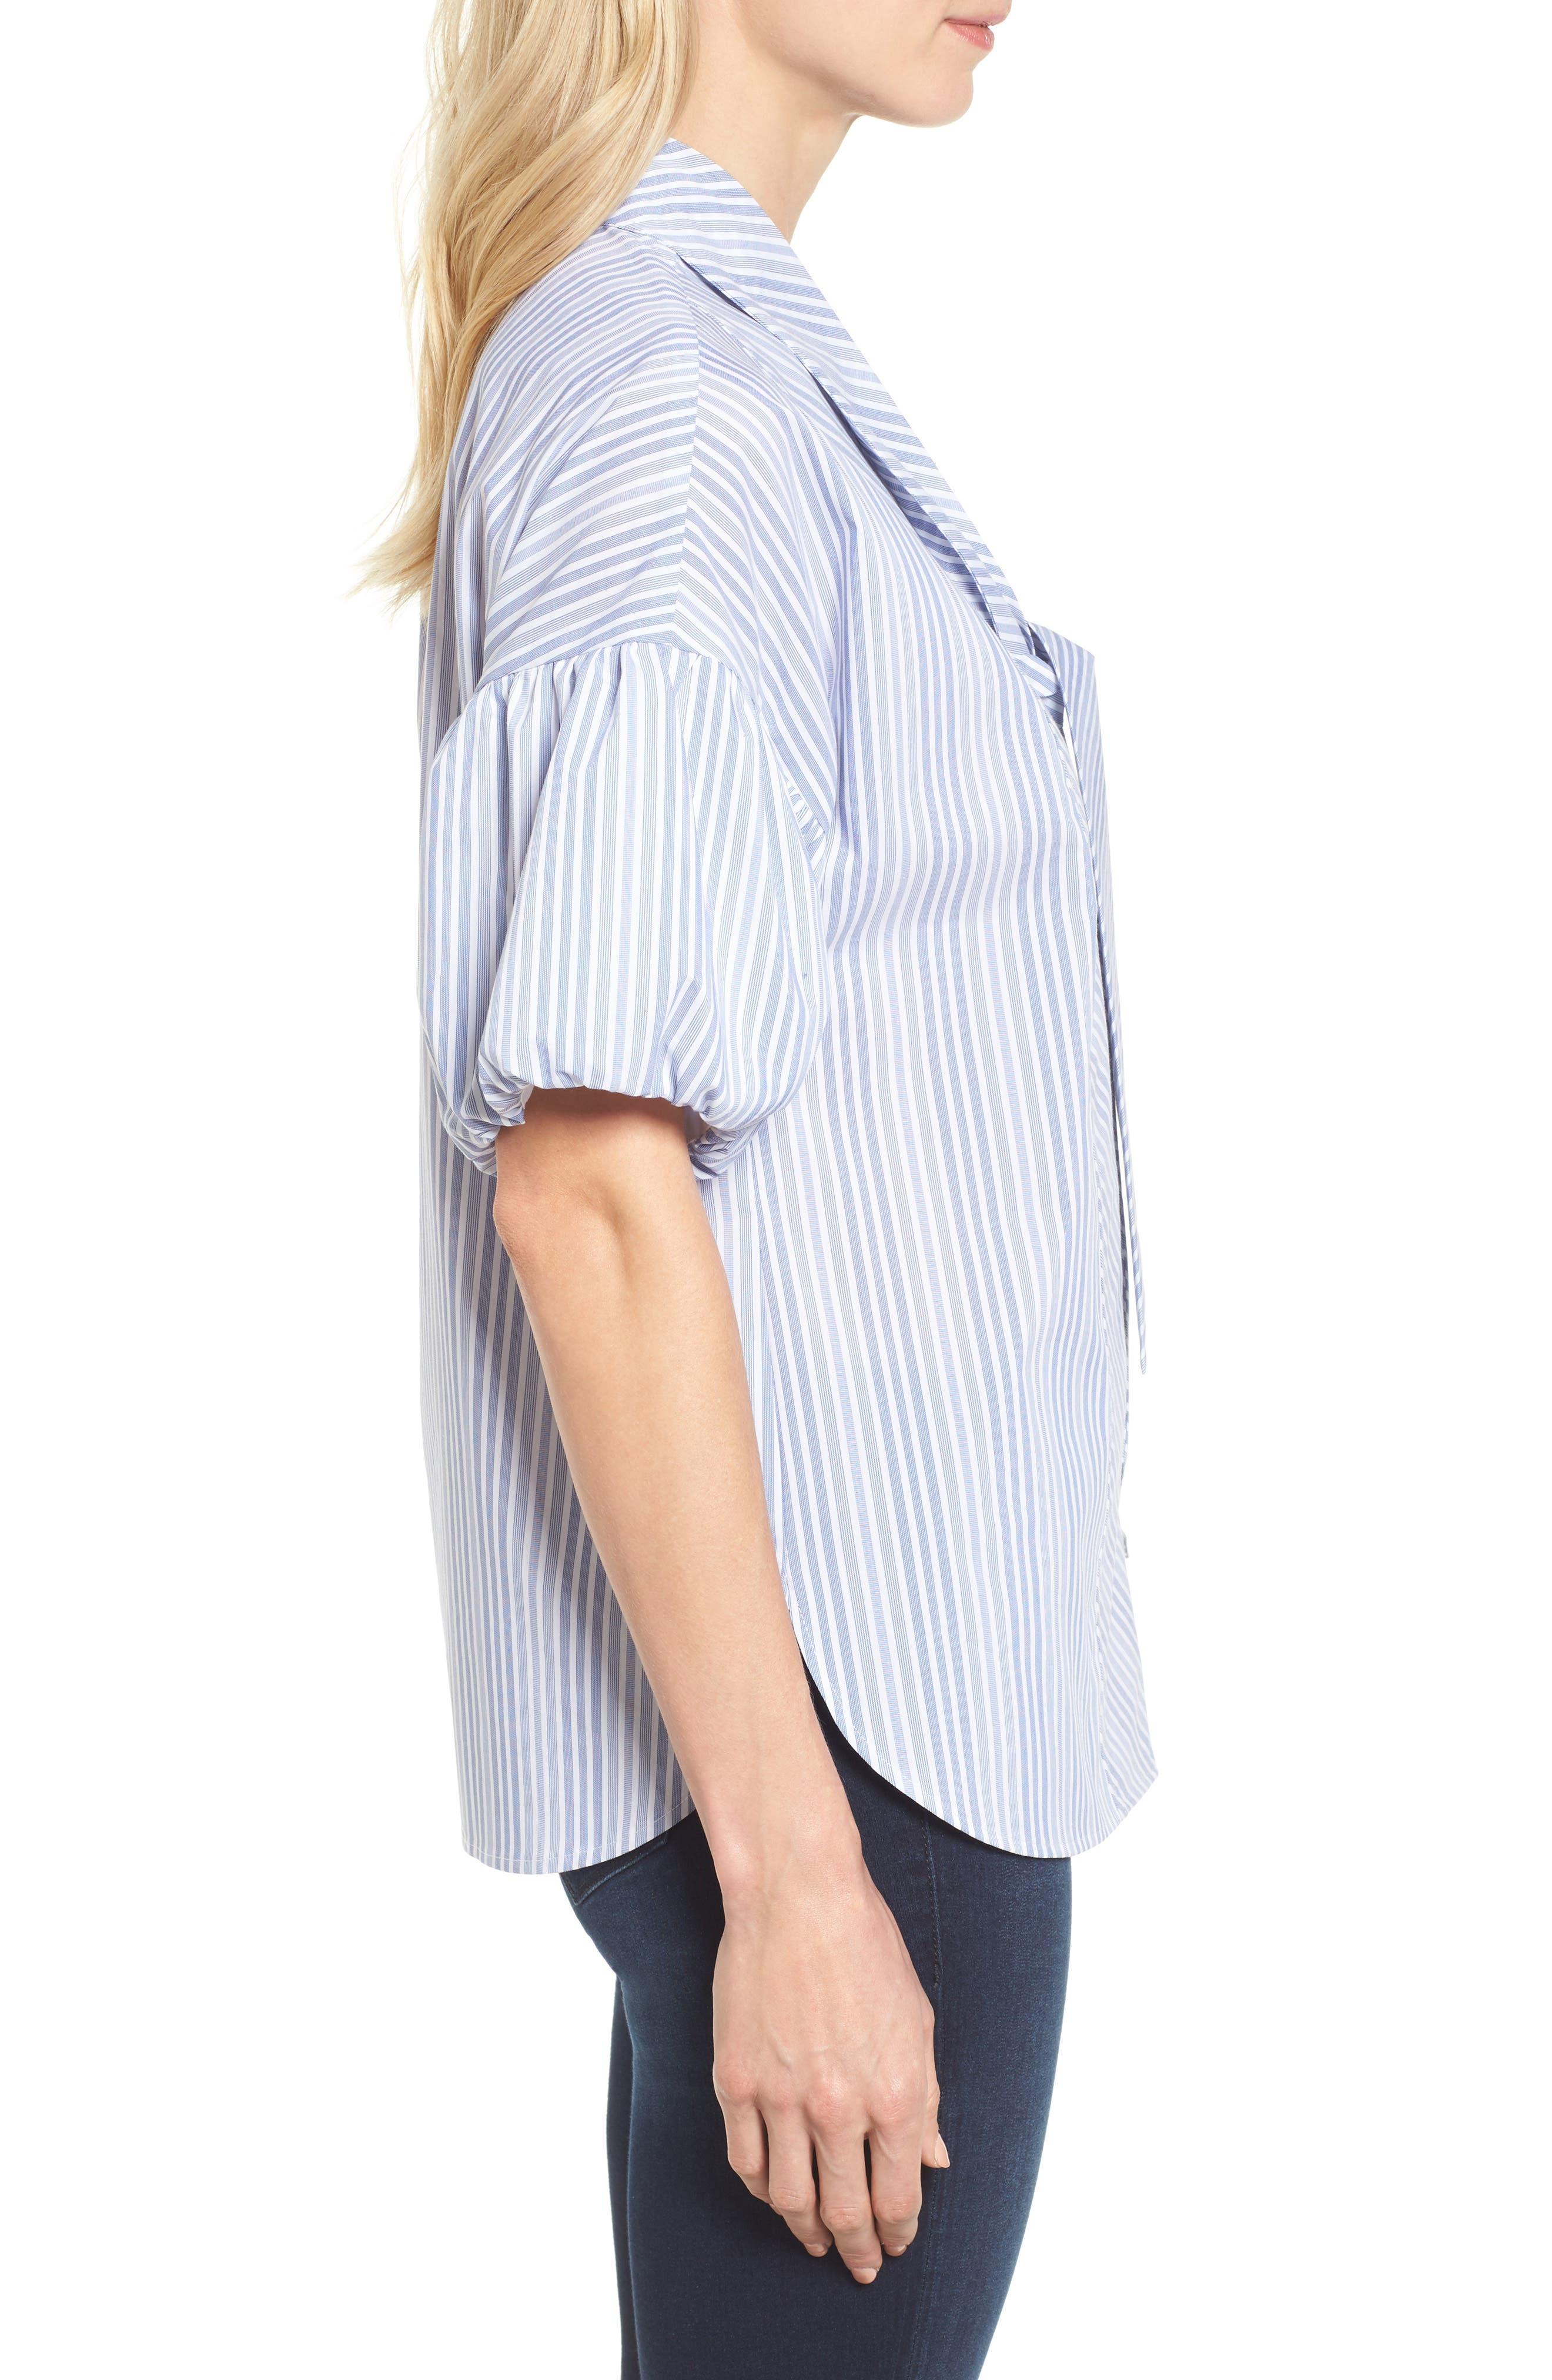 Tie Front Short Sleeve Blouse,                             Alternate thumbnail 4, color,                             Blue- White Stripe